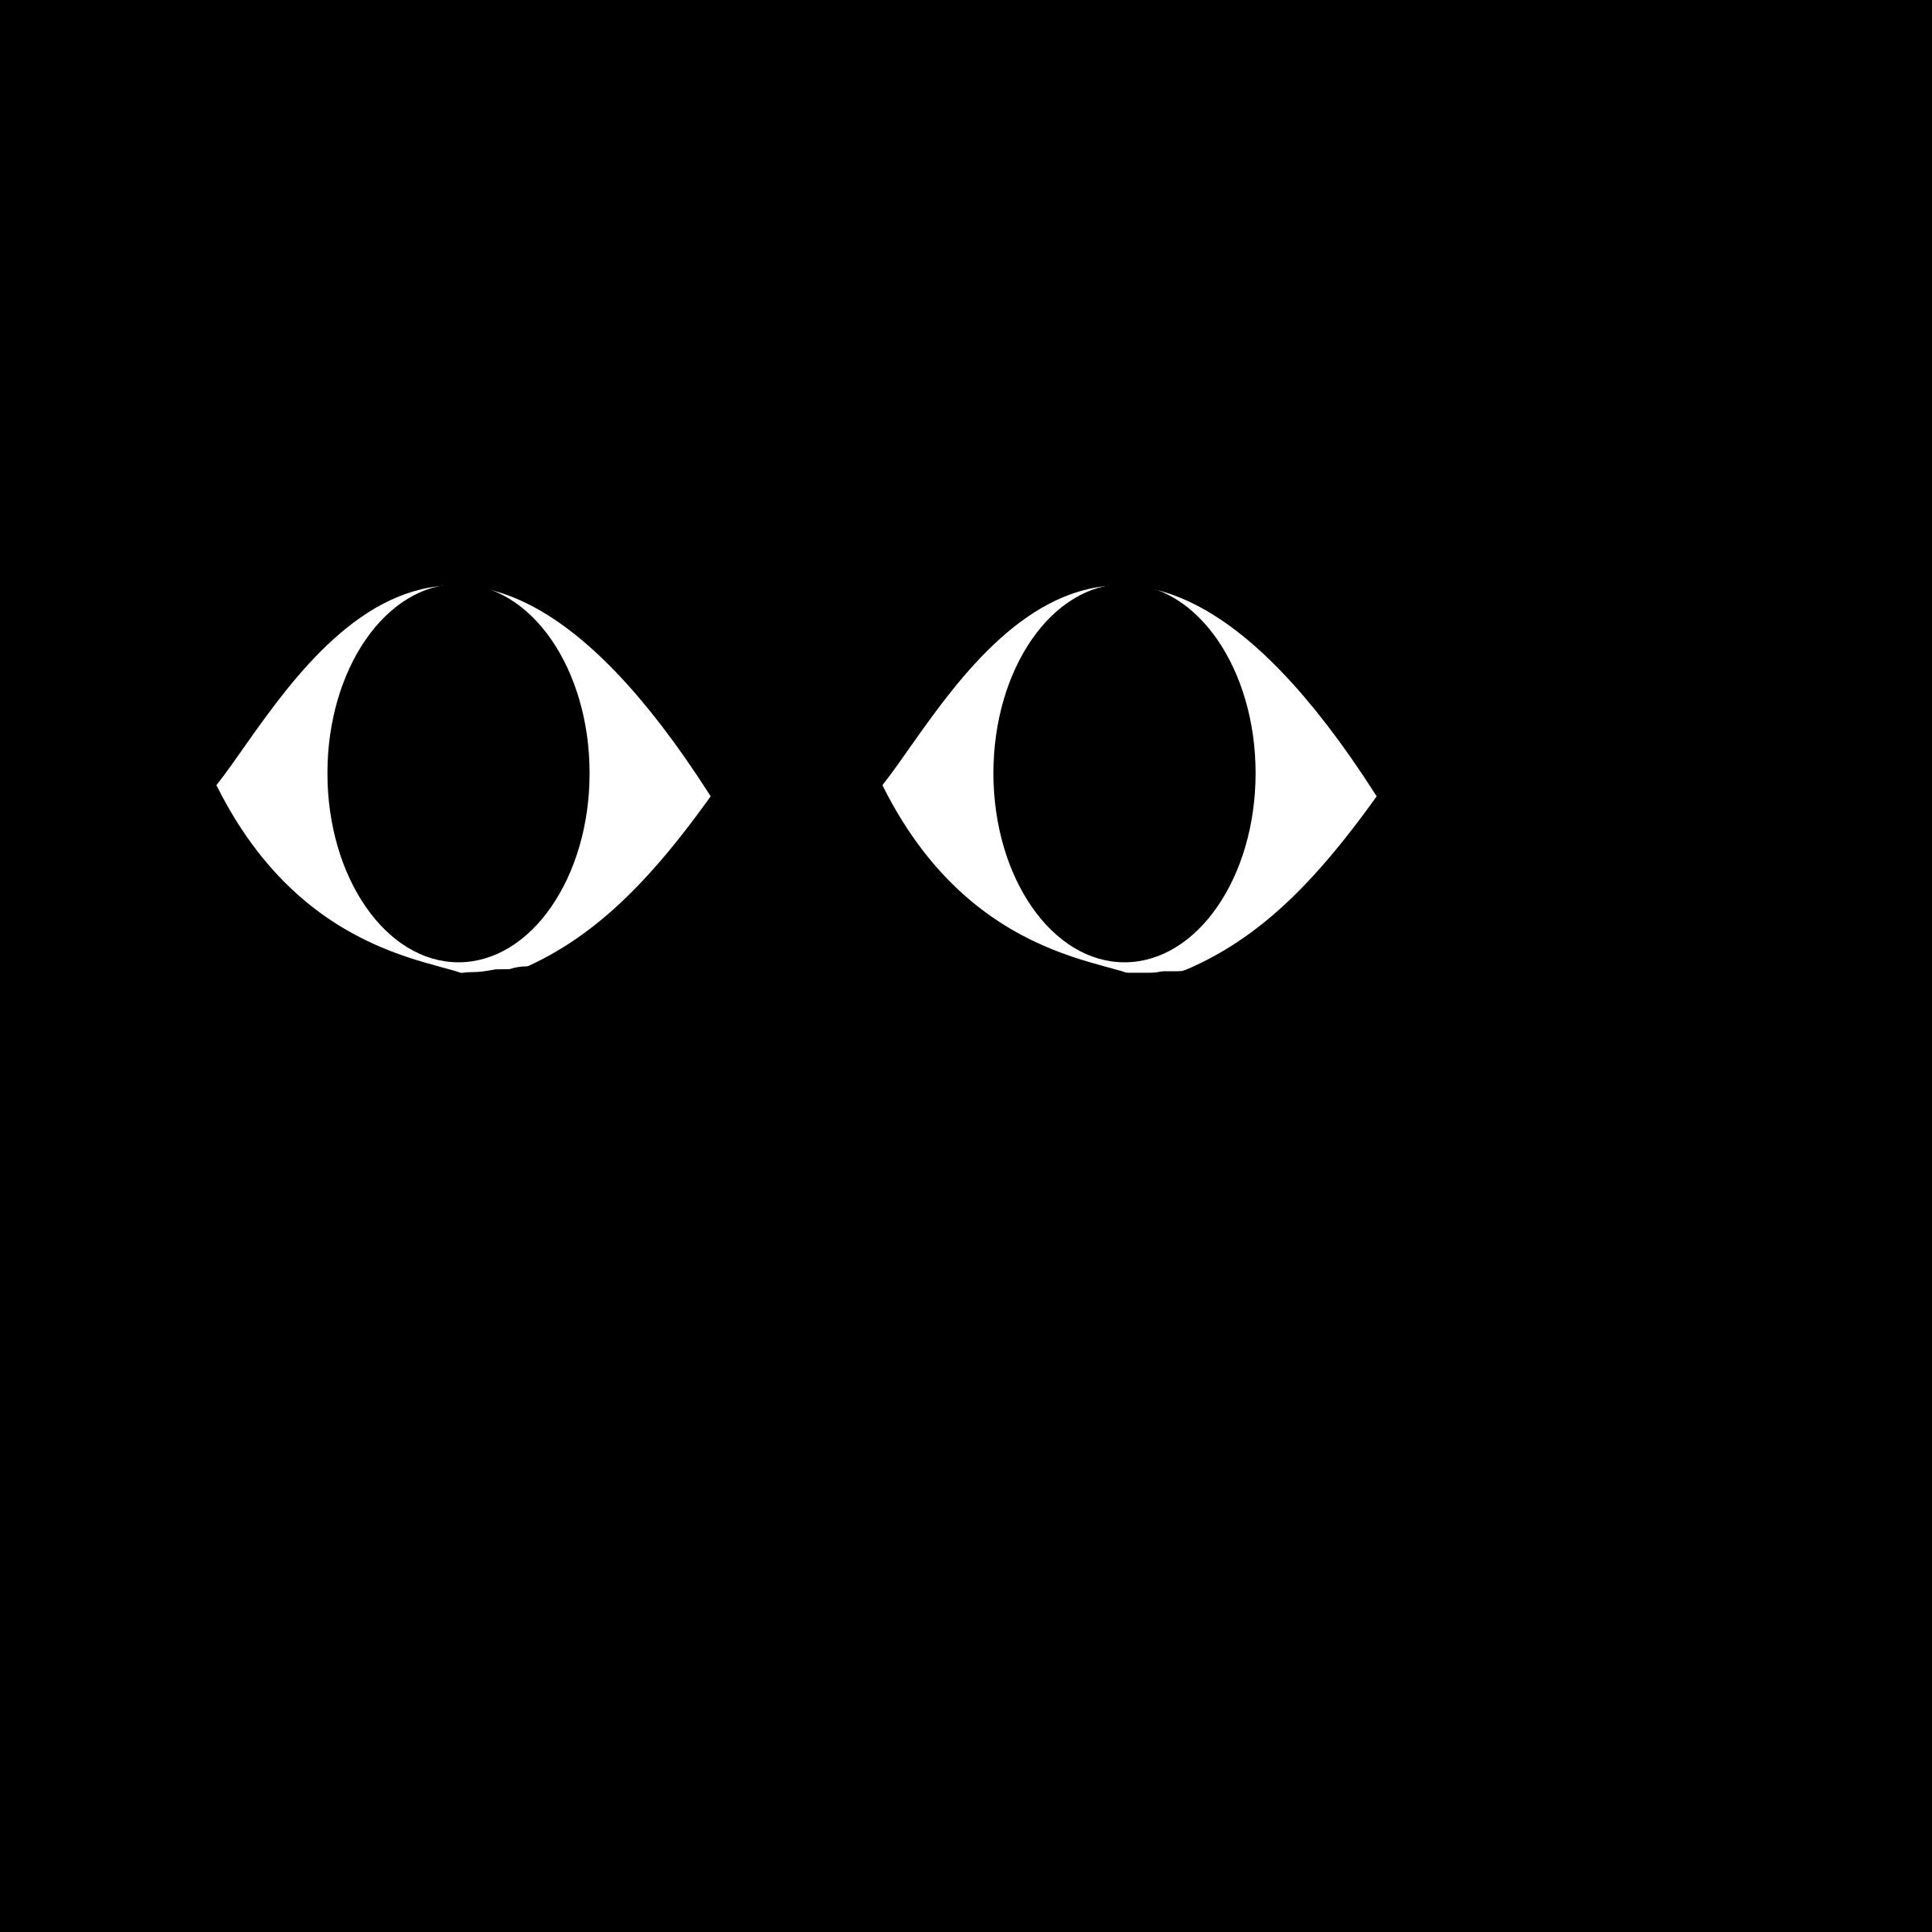 Download Black Cat Transparent HQ PNG Image | FreePNGImg